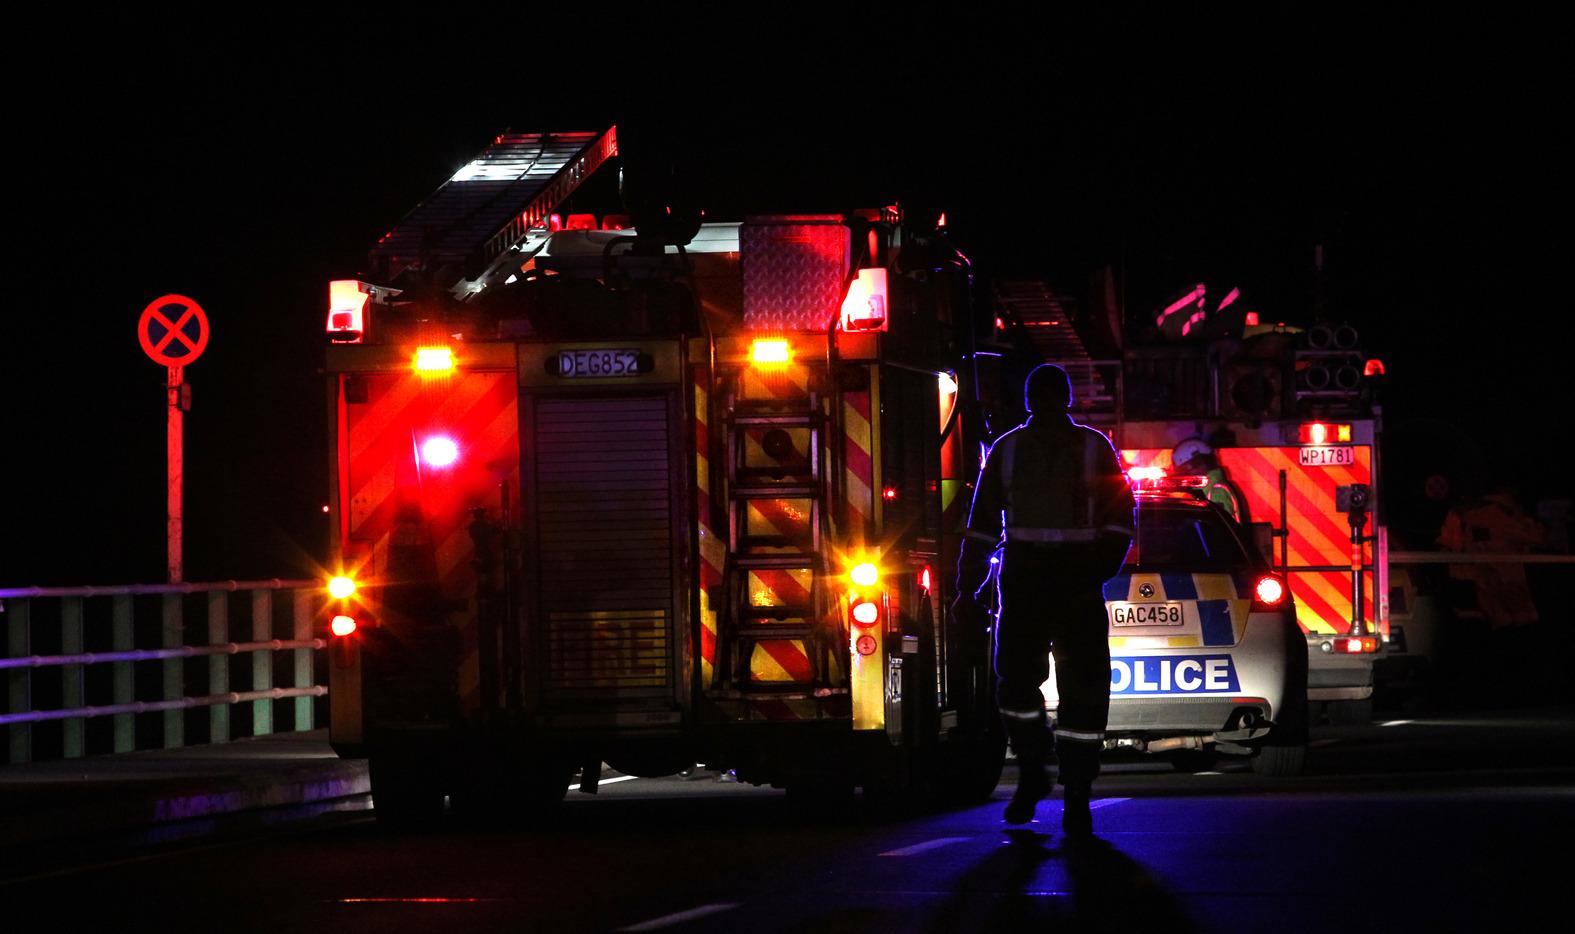 Police come across house on fire in Rotorua's Miller Street